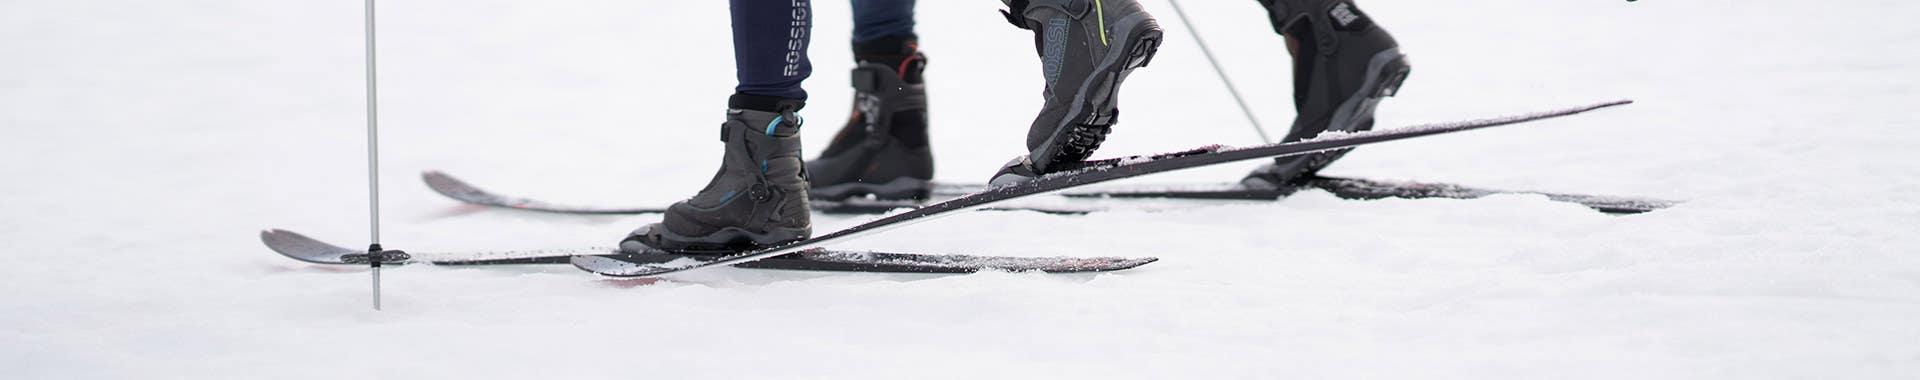 Chaussures ski de fond touring